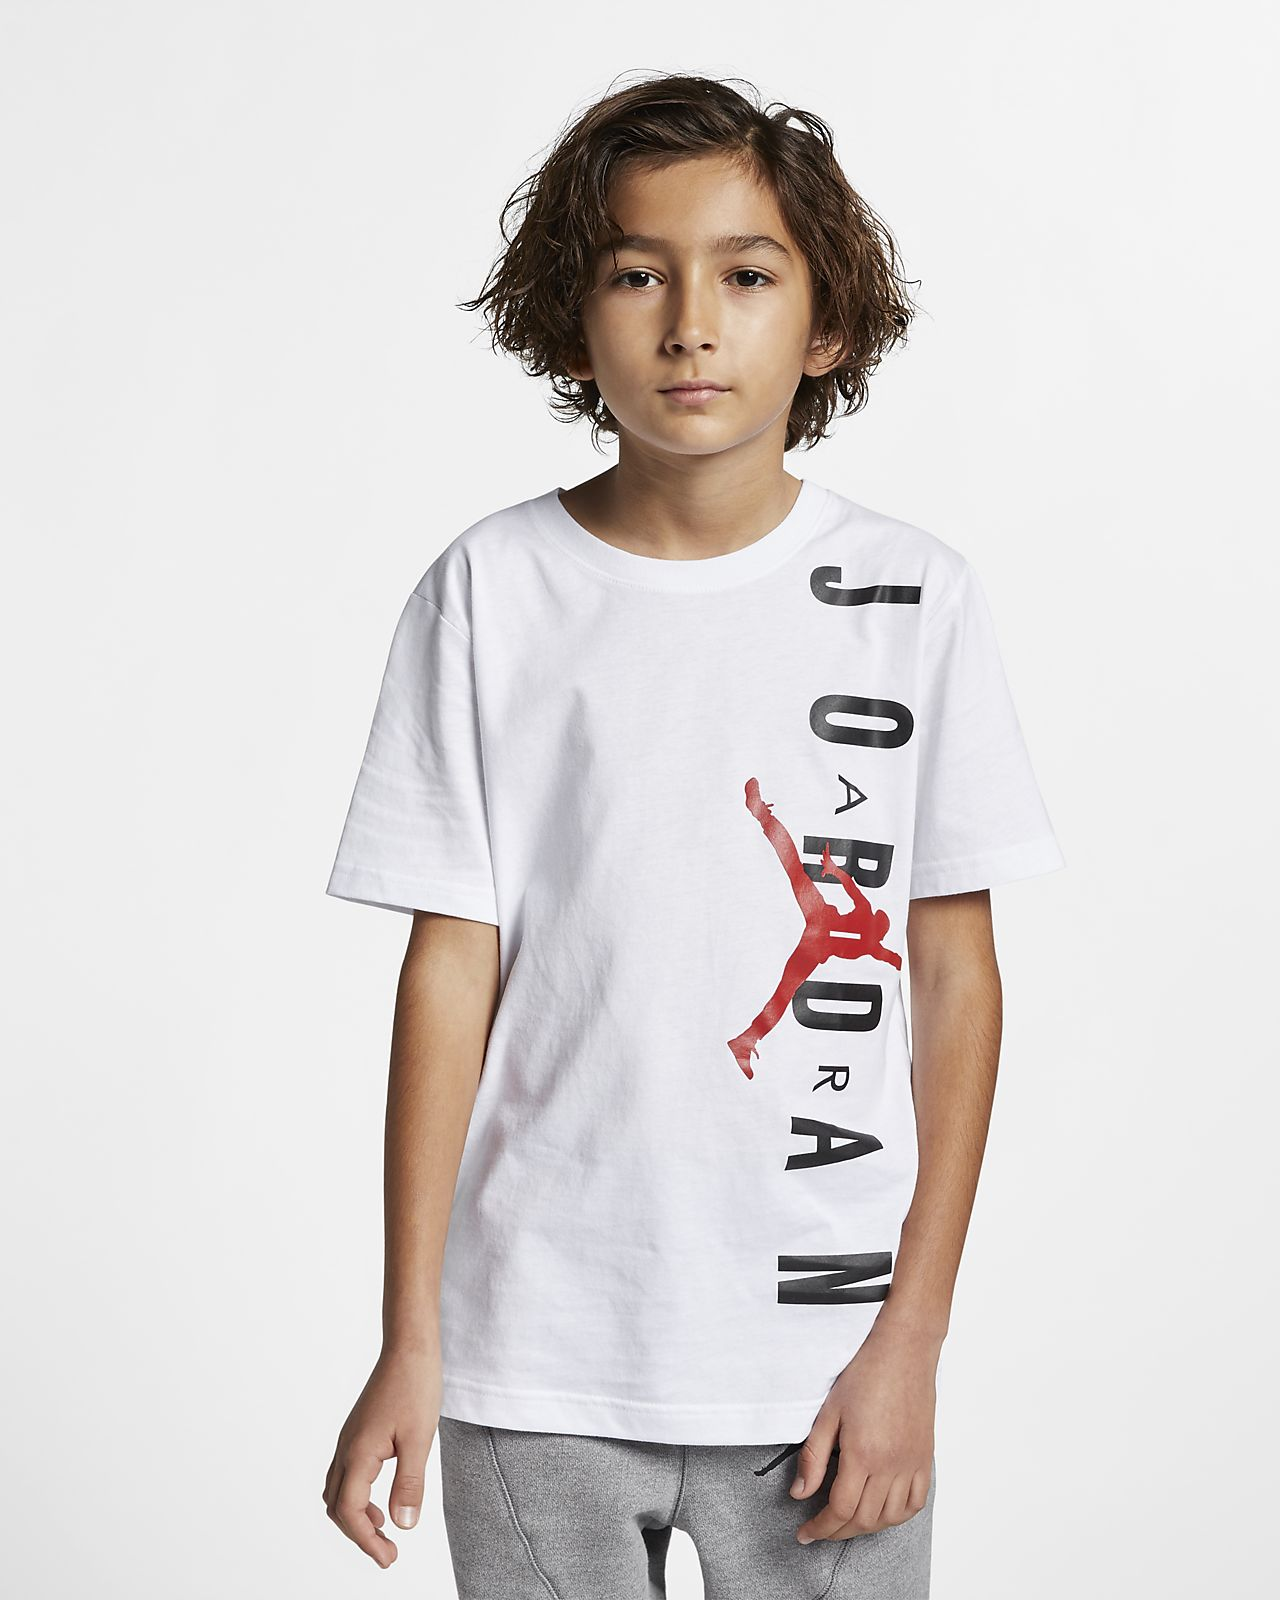 Garçon Jordan Air Be Pour Tee Plus Âgé Shirt Jumpman q5xUXAU